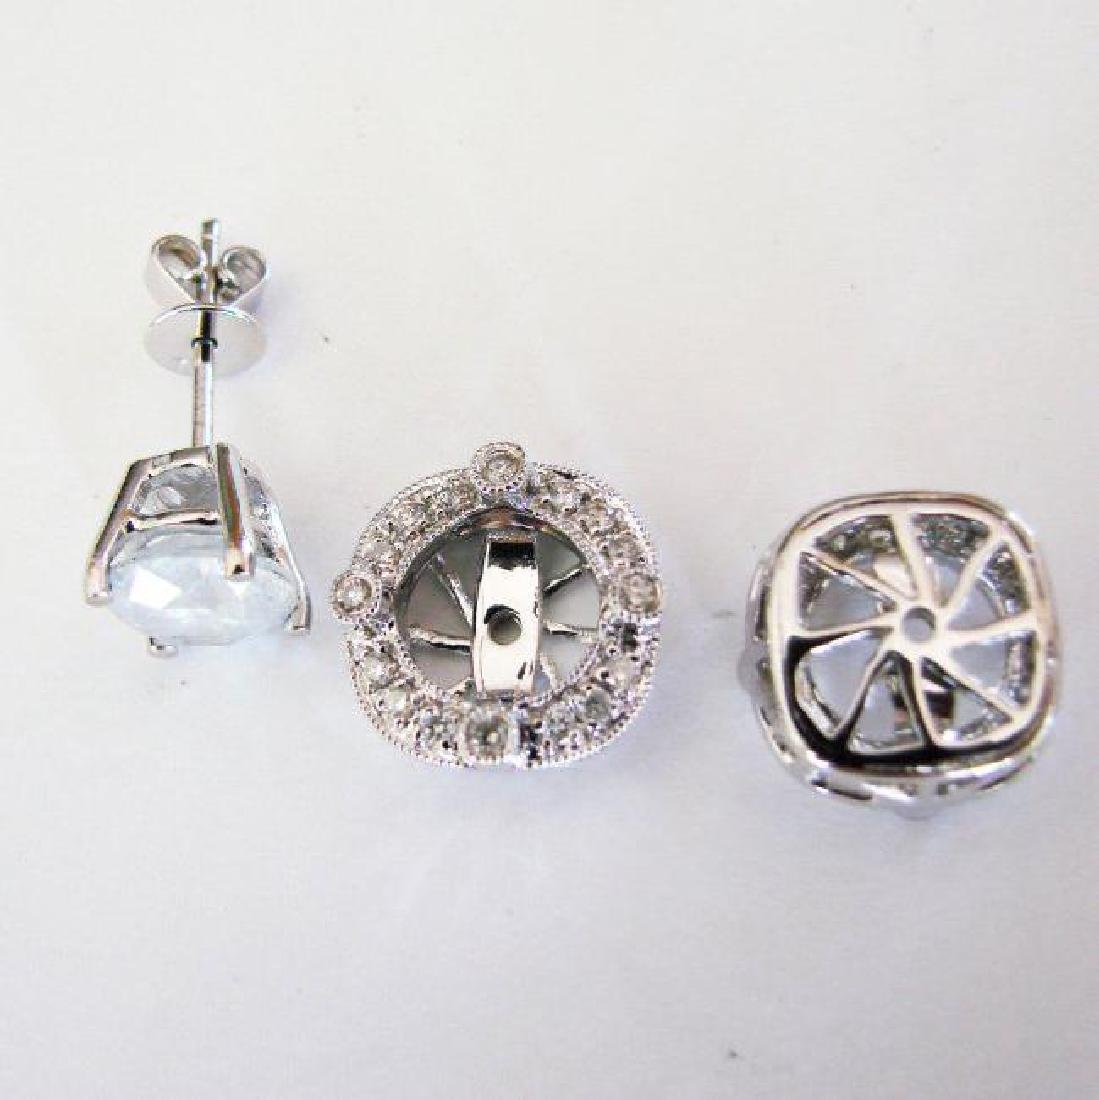 Jacket Stud Earrings Diamond 3.03Ct 18K White Gold - 7